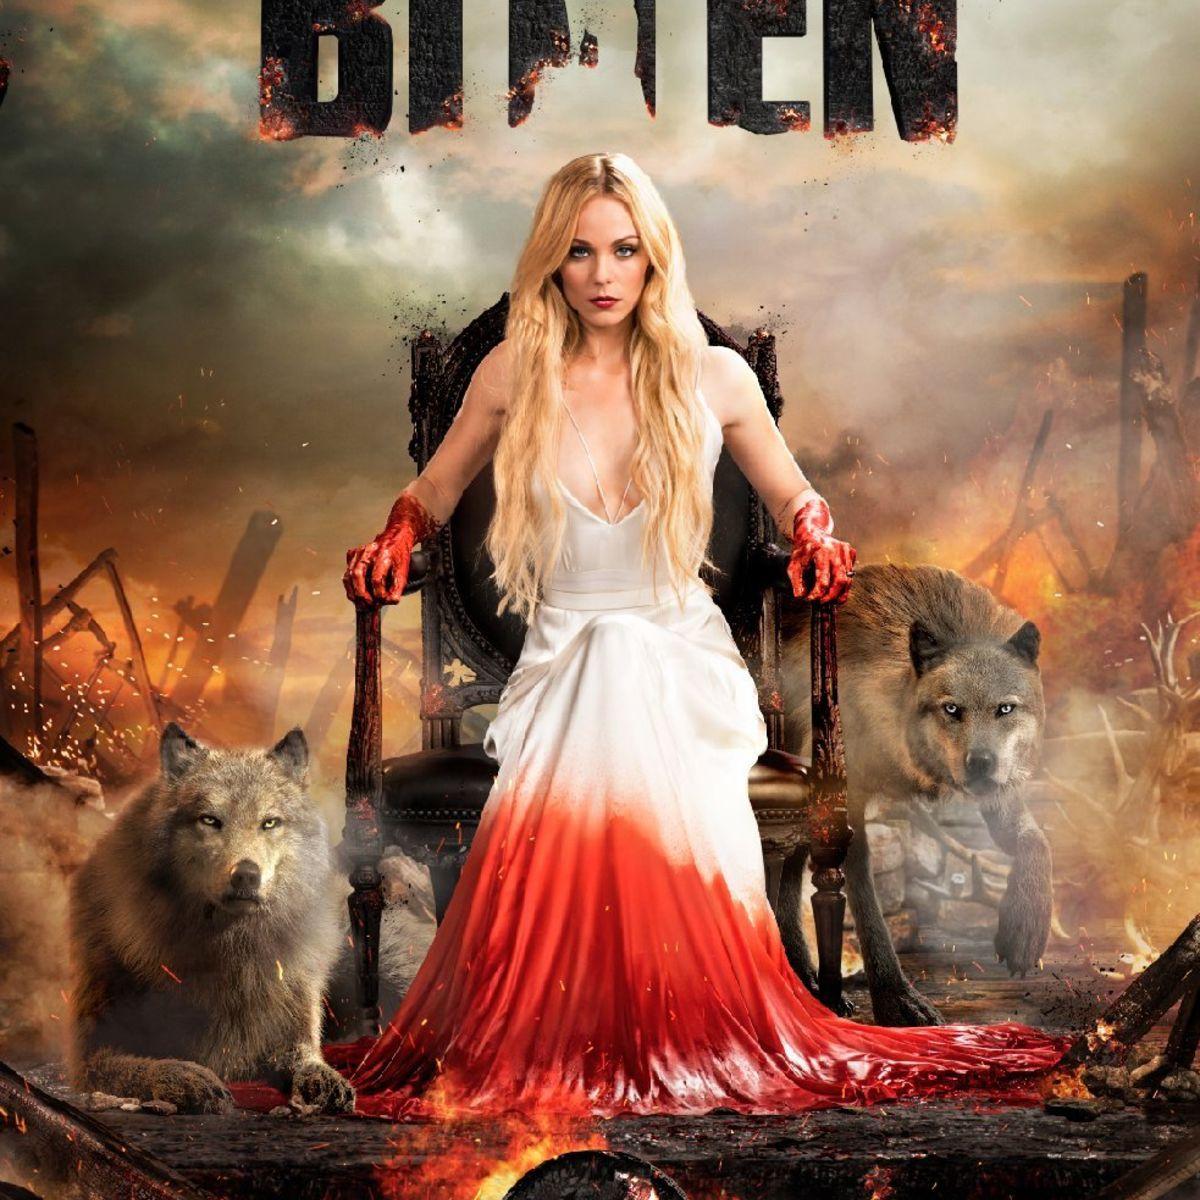 werewolf drama bitten wolfs out with 9 new dramatic season 3 posters